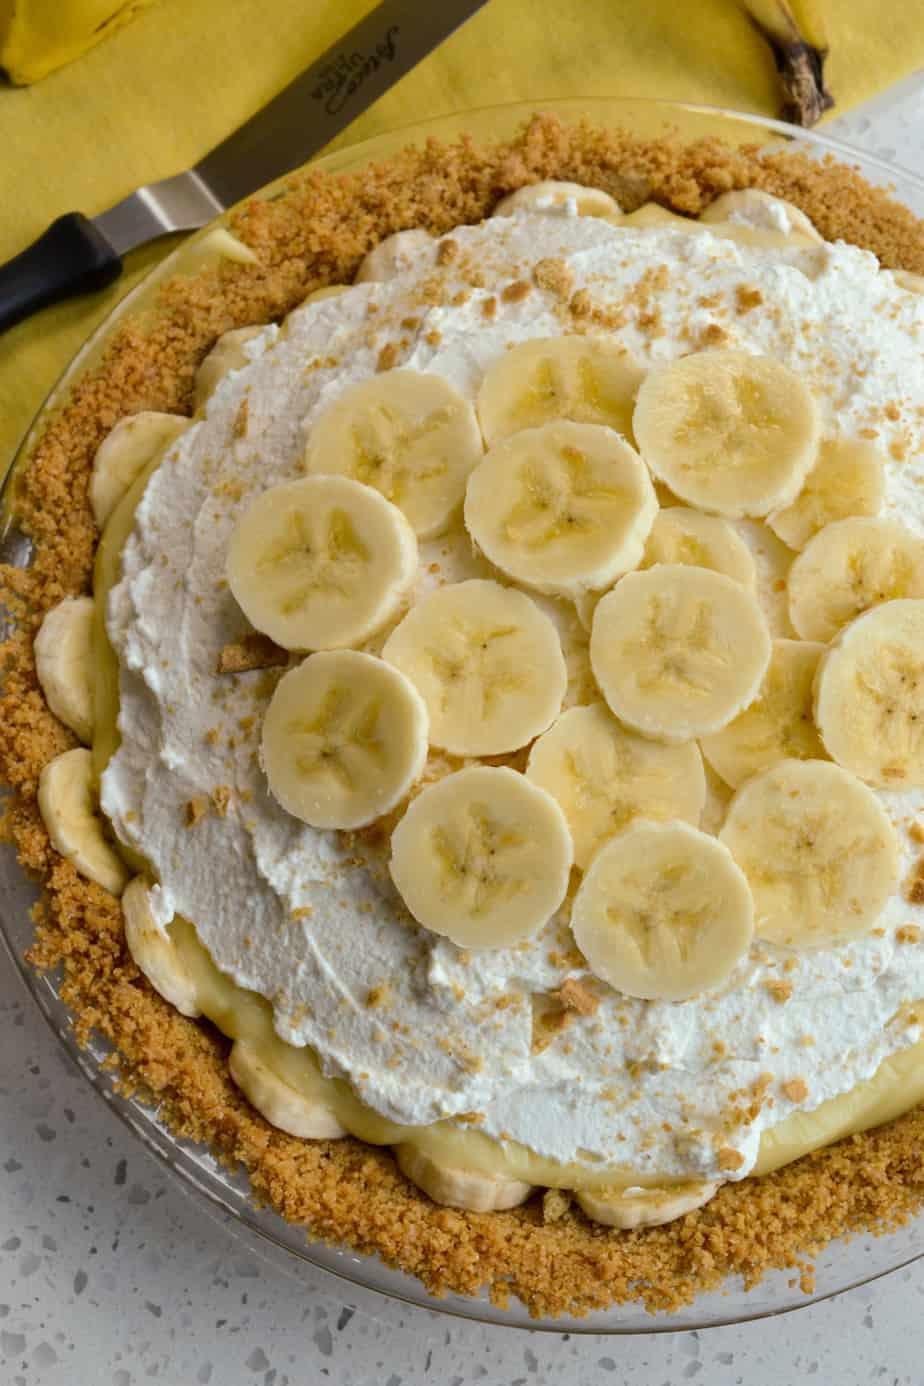 Creamy banana pie with a fresh graham cracker crust and homemade vanilla pudding.